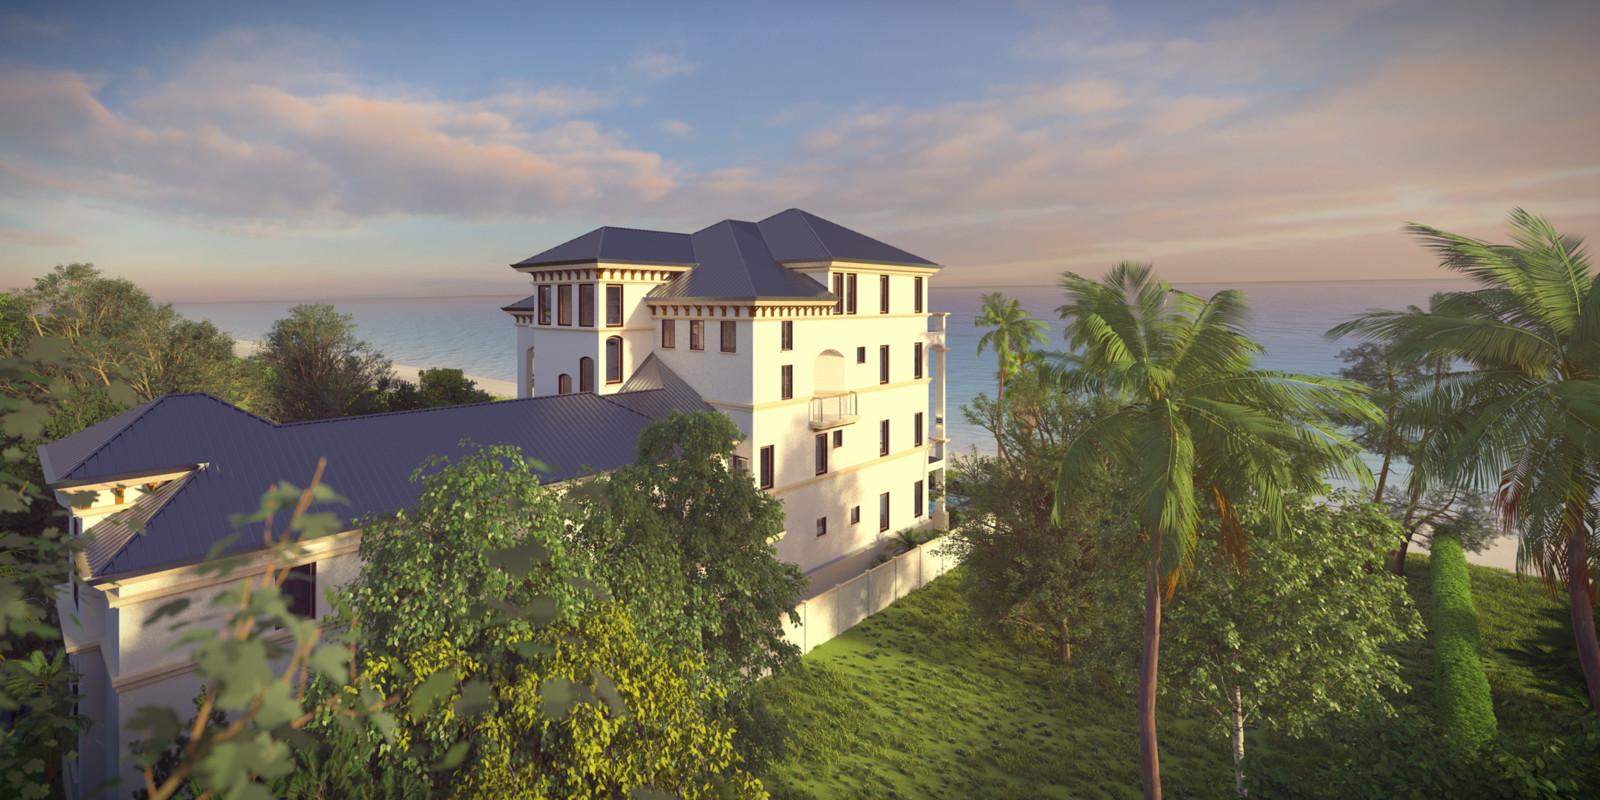 SketchUp + Thea Render  Seagrove Beach House: Scene 11A B Lumina Early 2160 × 1080 Presto MC Bucket